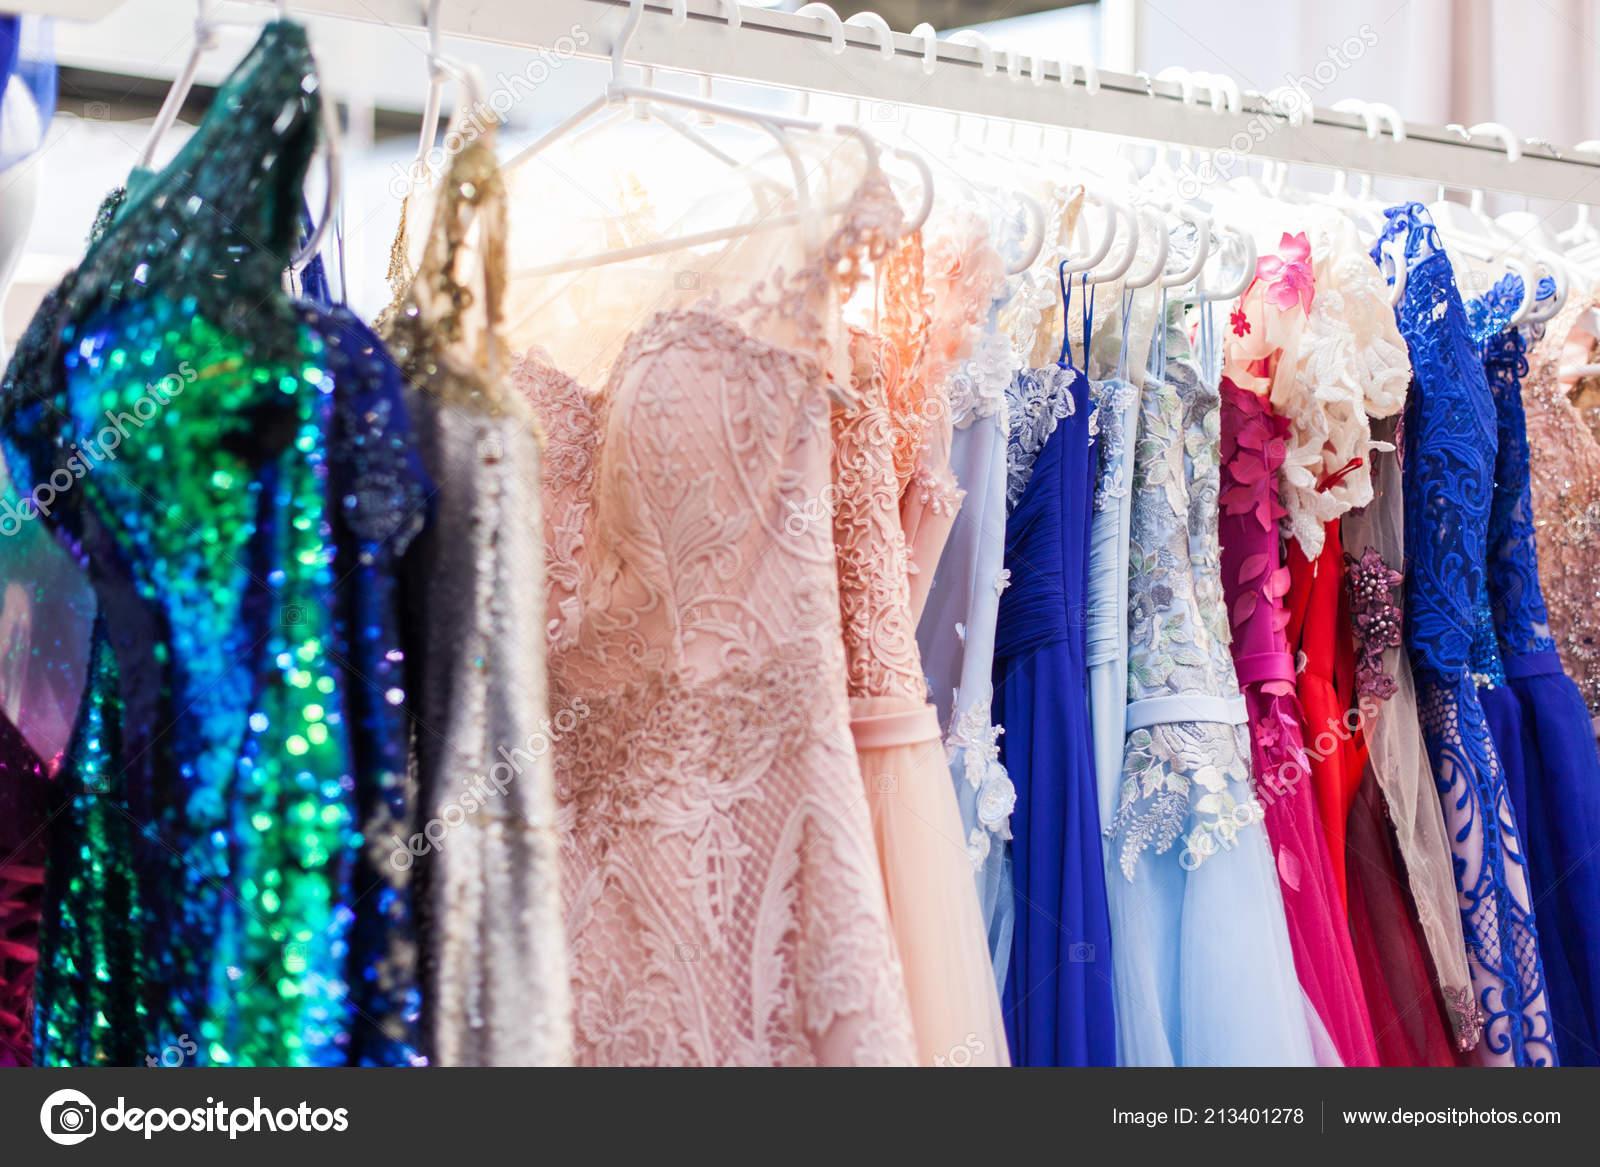 9b716ebc40c8 Ράφι Κομψά Βραδινά Φορέματα Για Κατάστημα Ειδών Ένδυσης — Φωτογραφία Αρχείου